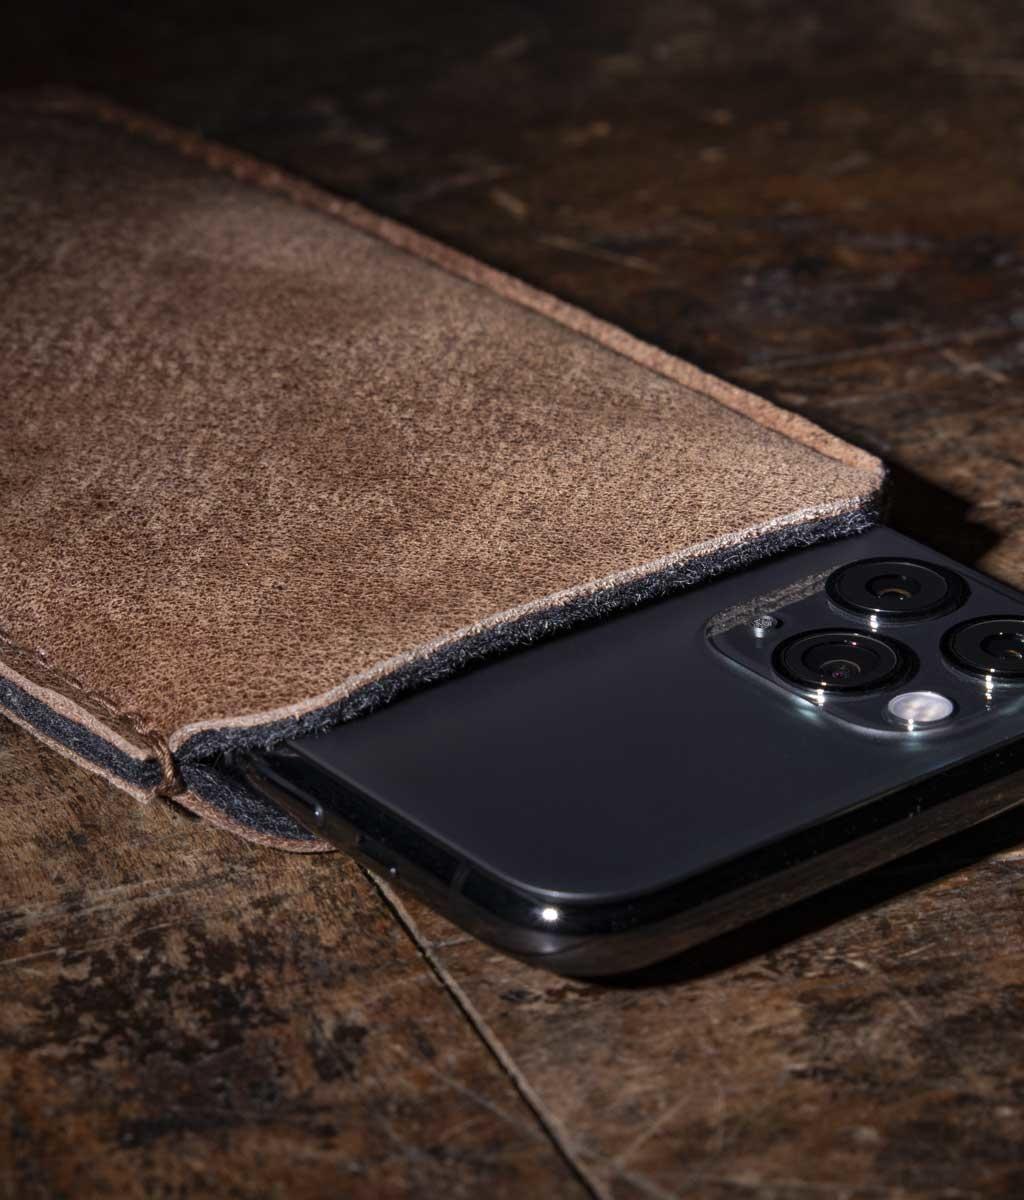 iPhone 12 11 Pro SE Max mini XR 8 case leather sleeve felt lining DATENSCHUTZ